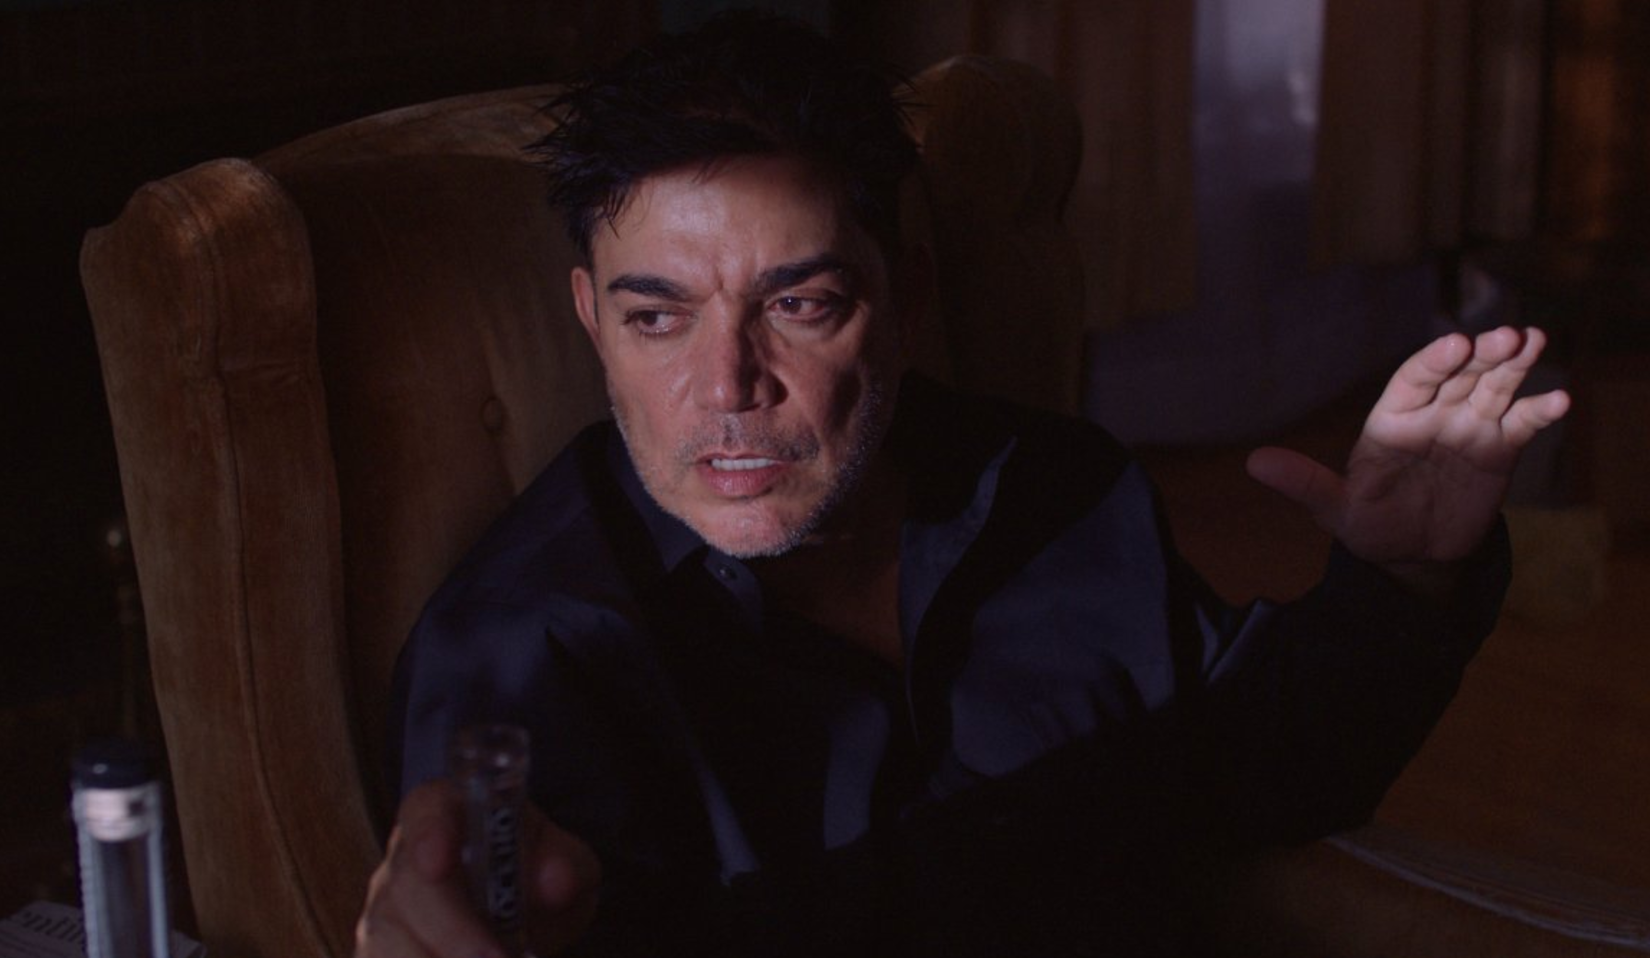 Michael DeLorenzo as Charlie Grissom